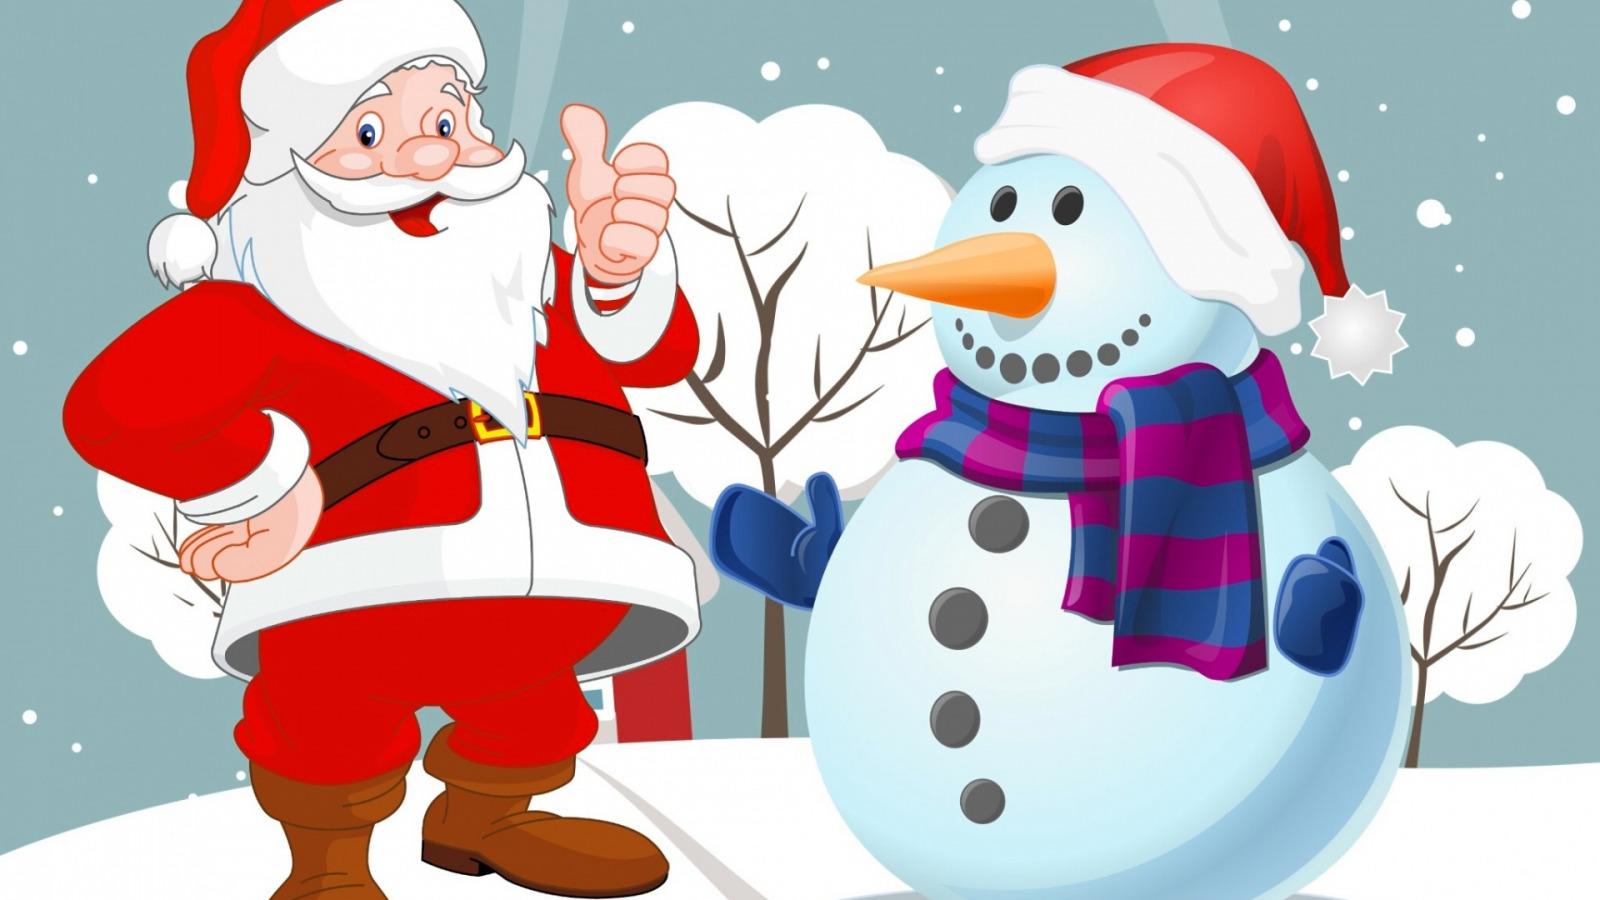 Новогодние картинки снеговики дед морозы снегурочки, машина ауди открытка